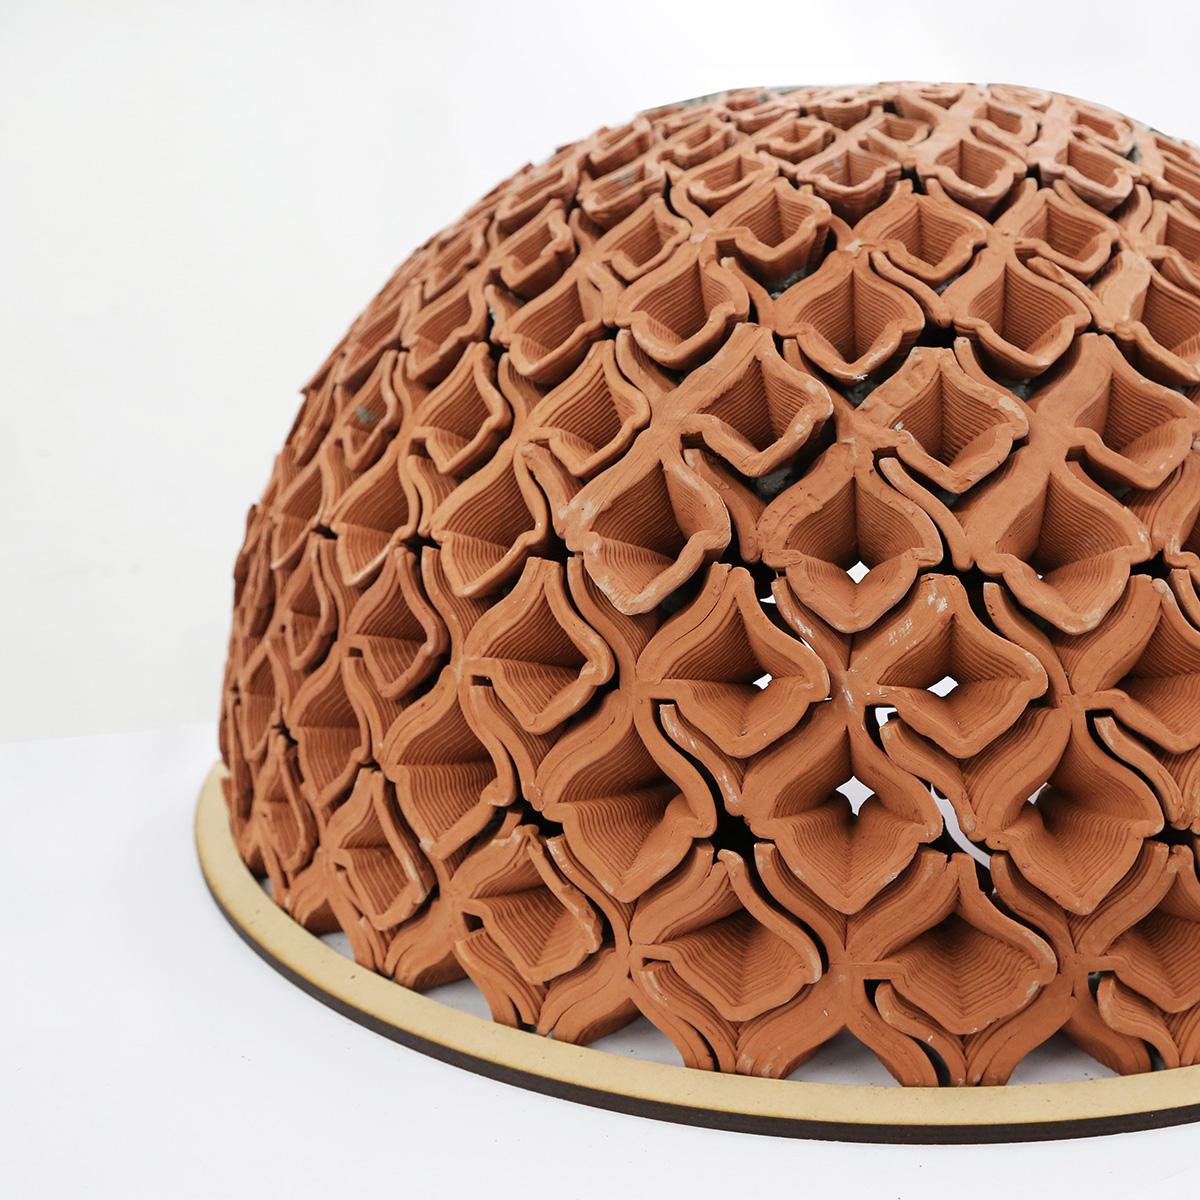 Robotic clay printing, autobryks, Brick specials, vaults, domes, arches, architecture, Christian J Lange, autobryks 3d